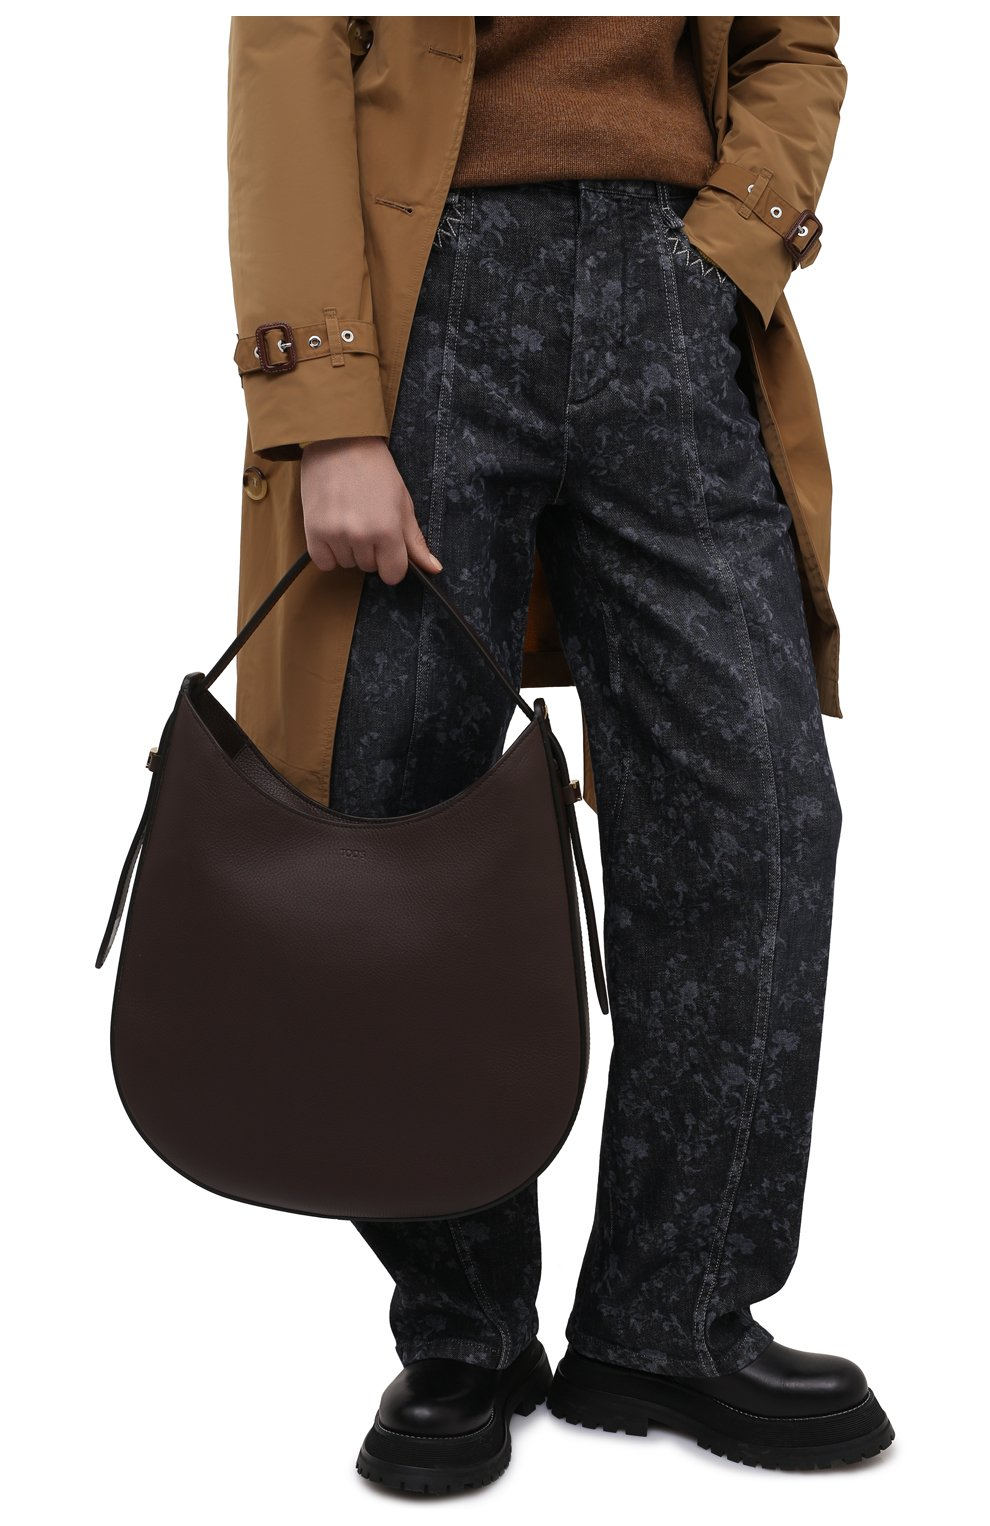 Женская сумка oboe TOD'S темно-коричневого цвета, арт. XBWA0RS0300P6Y | Фото 2 (Сумки-технические: Сумки top-handle; Материал: Натуральная кожа; Размер: large)